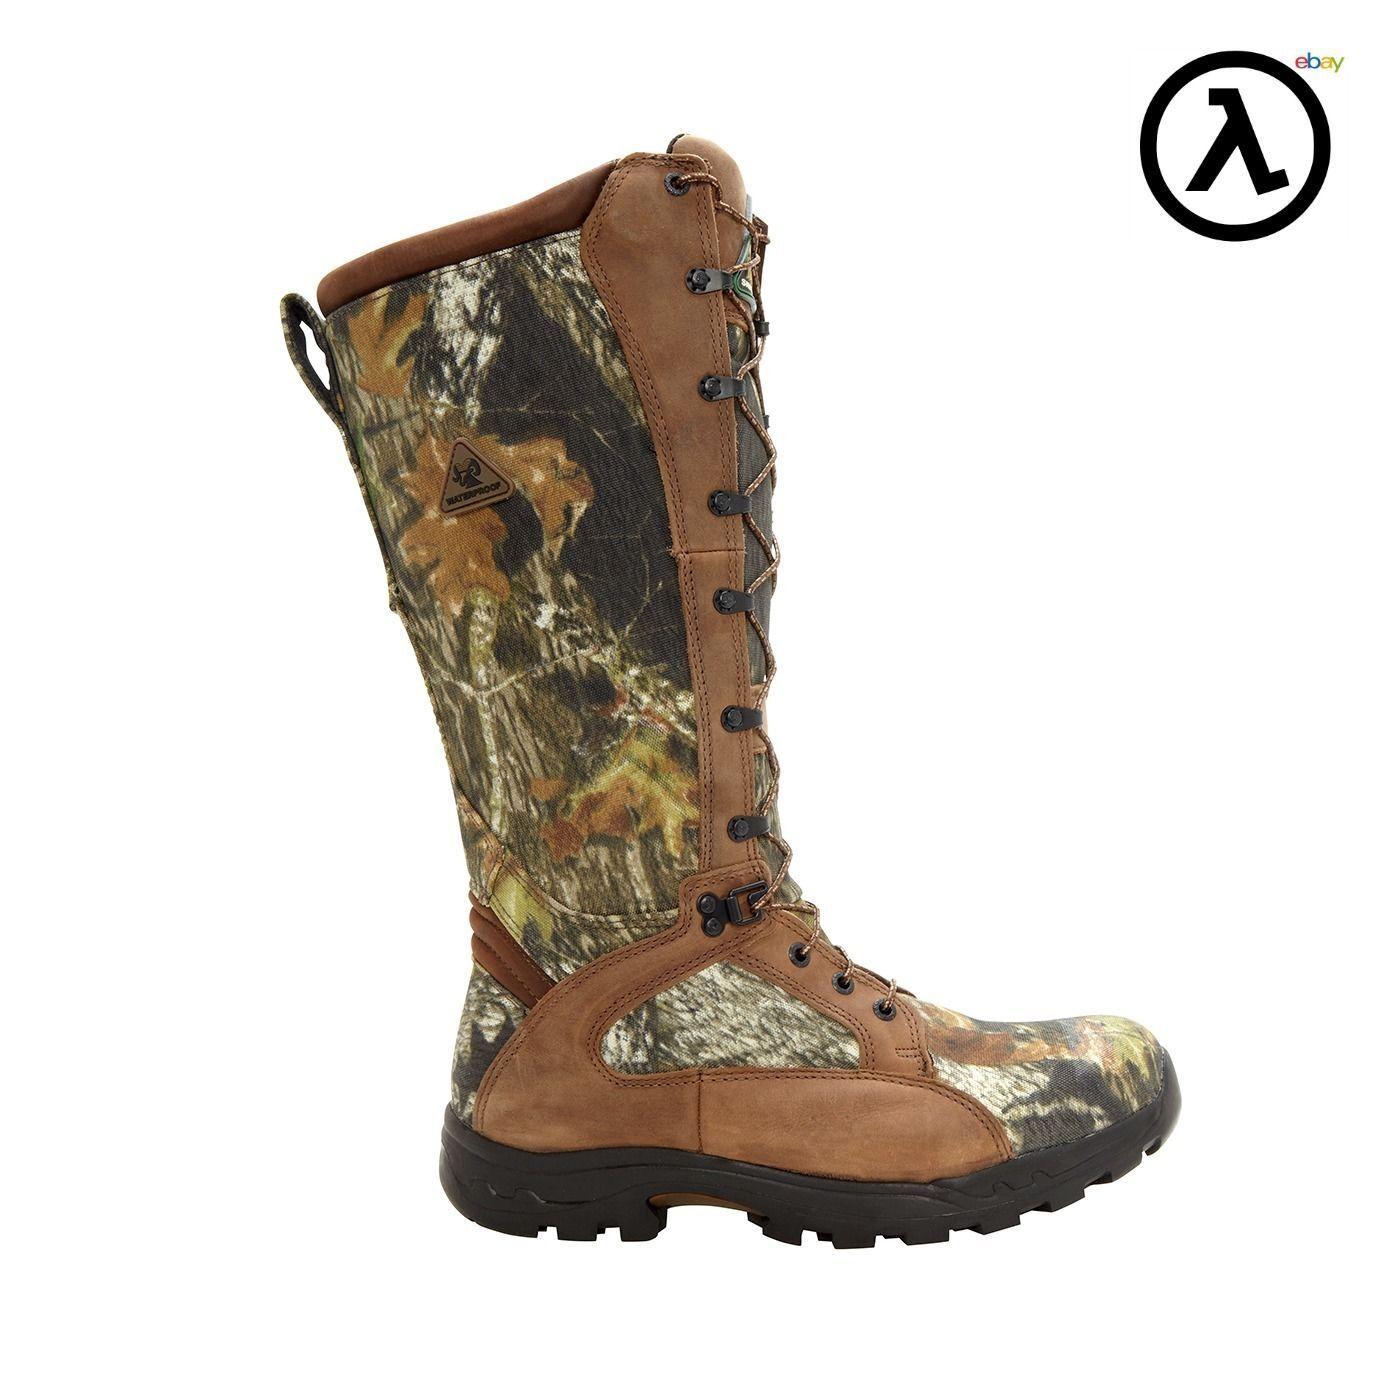 rocky prolight waterproof snake proof hunting boots